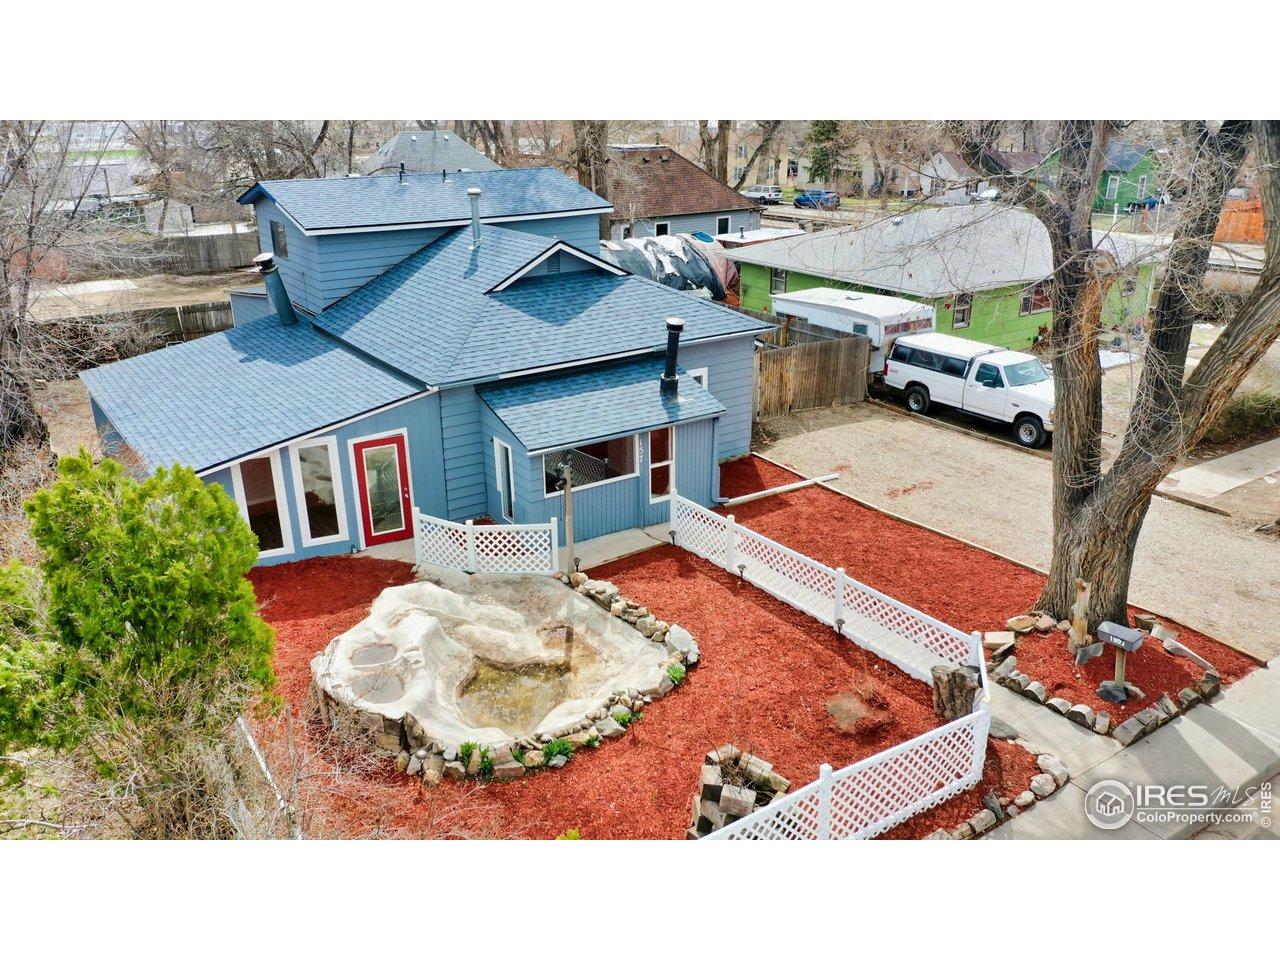 157 4th Ave, Longmont CO 80501